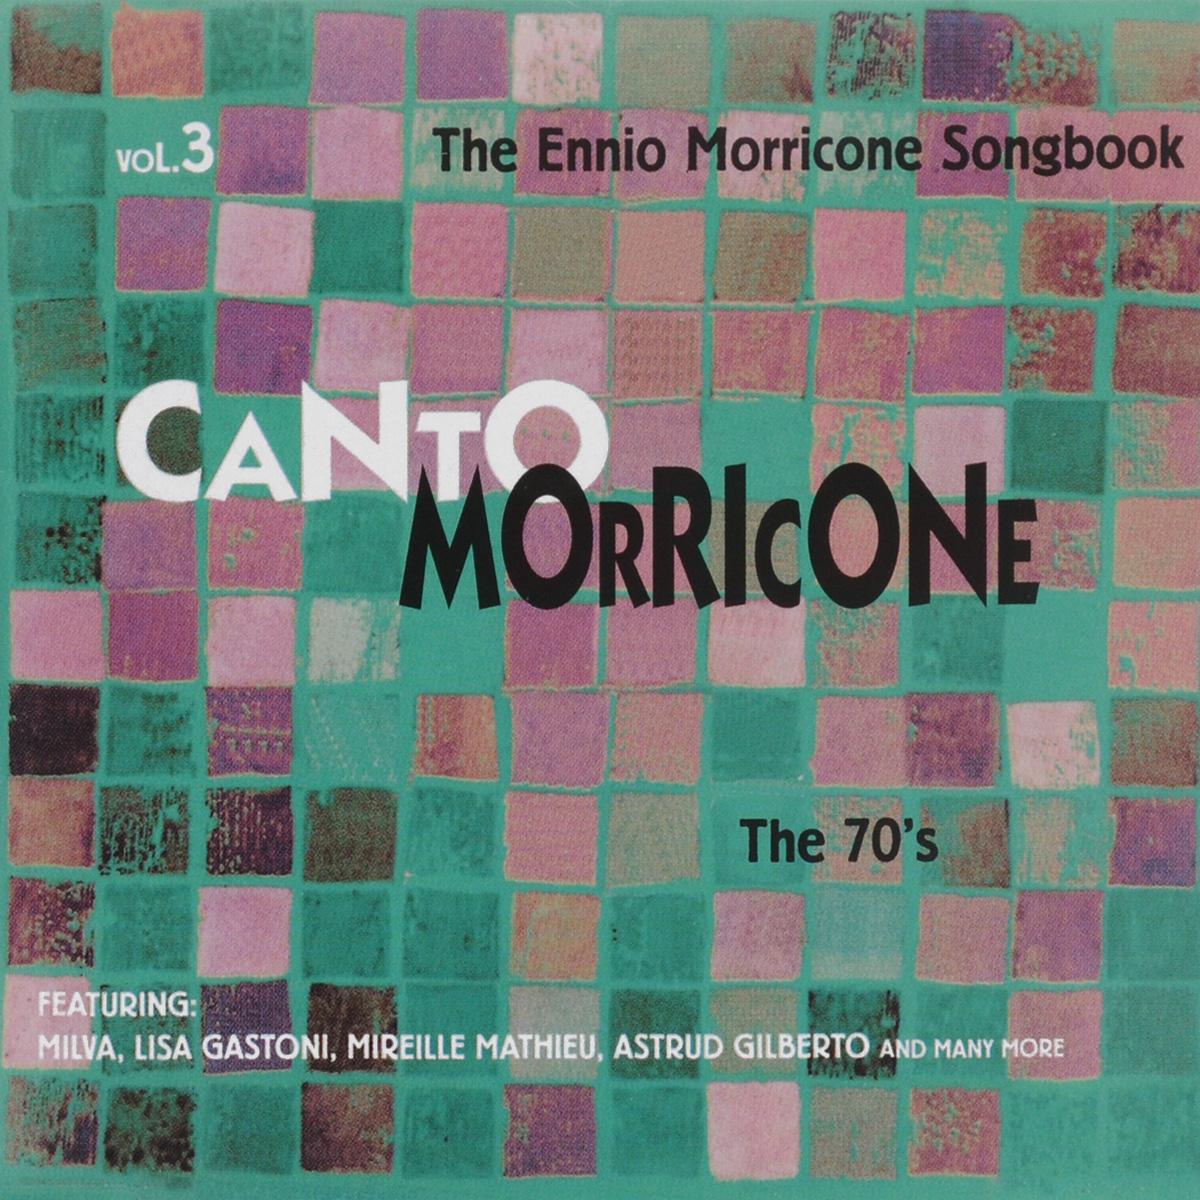 цена на Canto Morricone, Vol. 3: The Ennio Morricone Songbook - The 70's